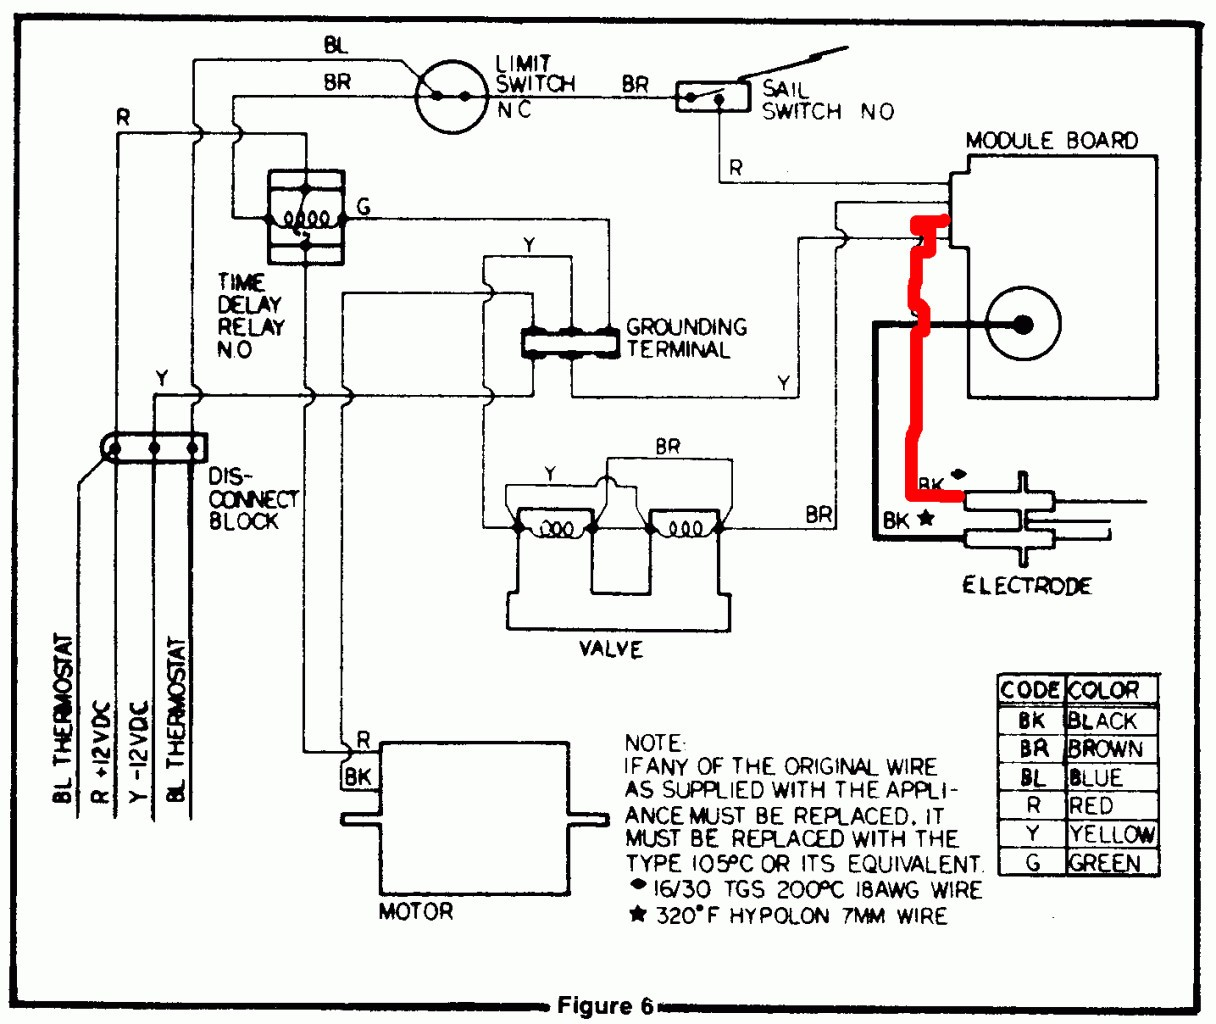 Rv Water System Diagram Fresh Nt22 02 Inside Suburban Rv Furnace Wiring Diagram Wiring Diagram – Diagram